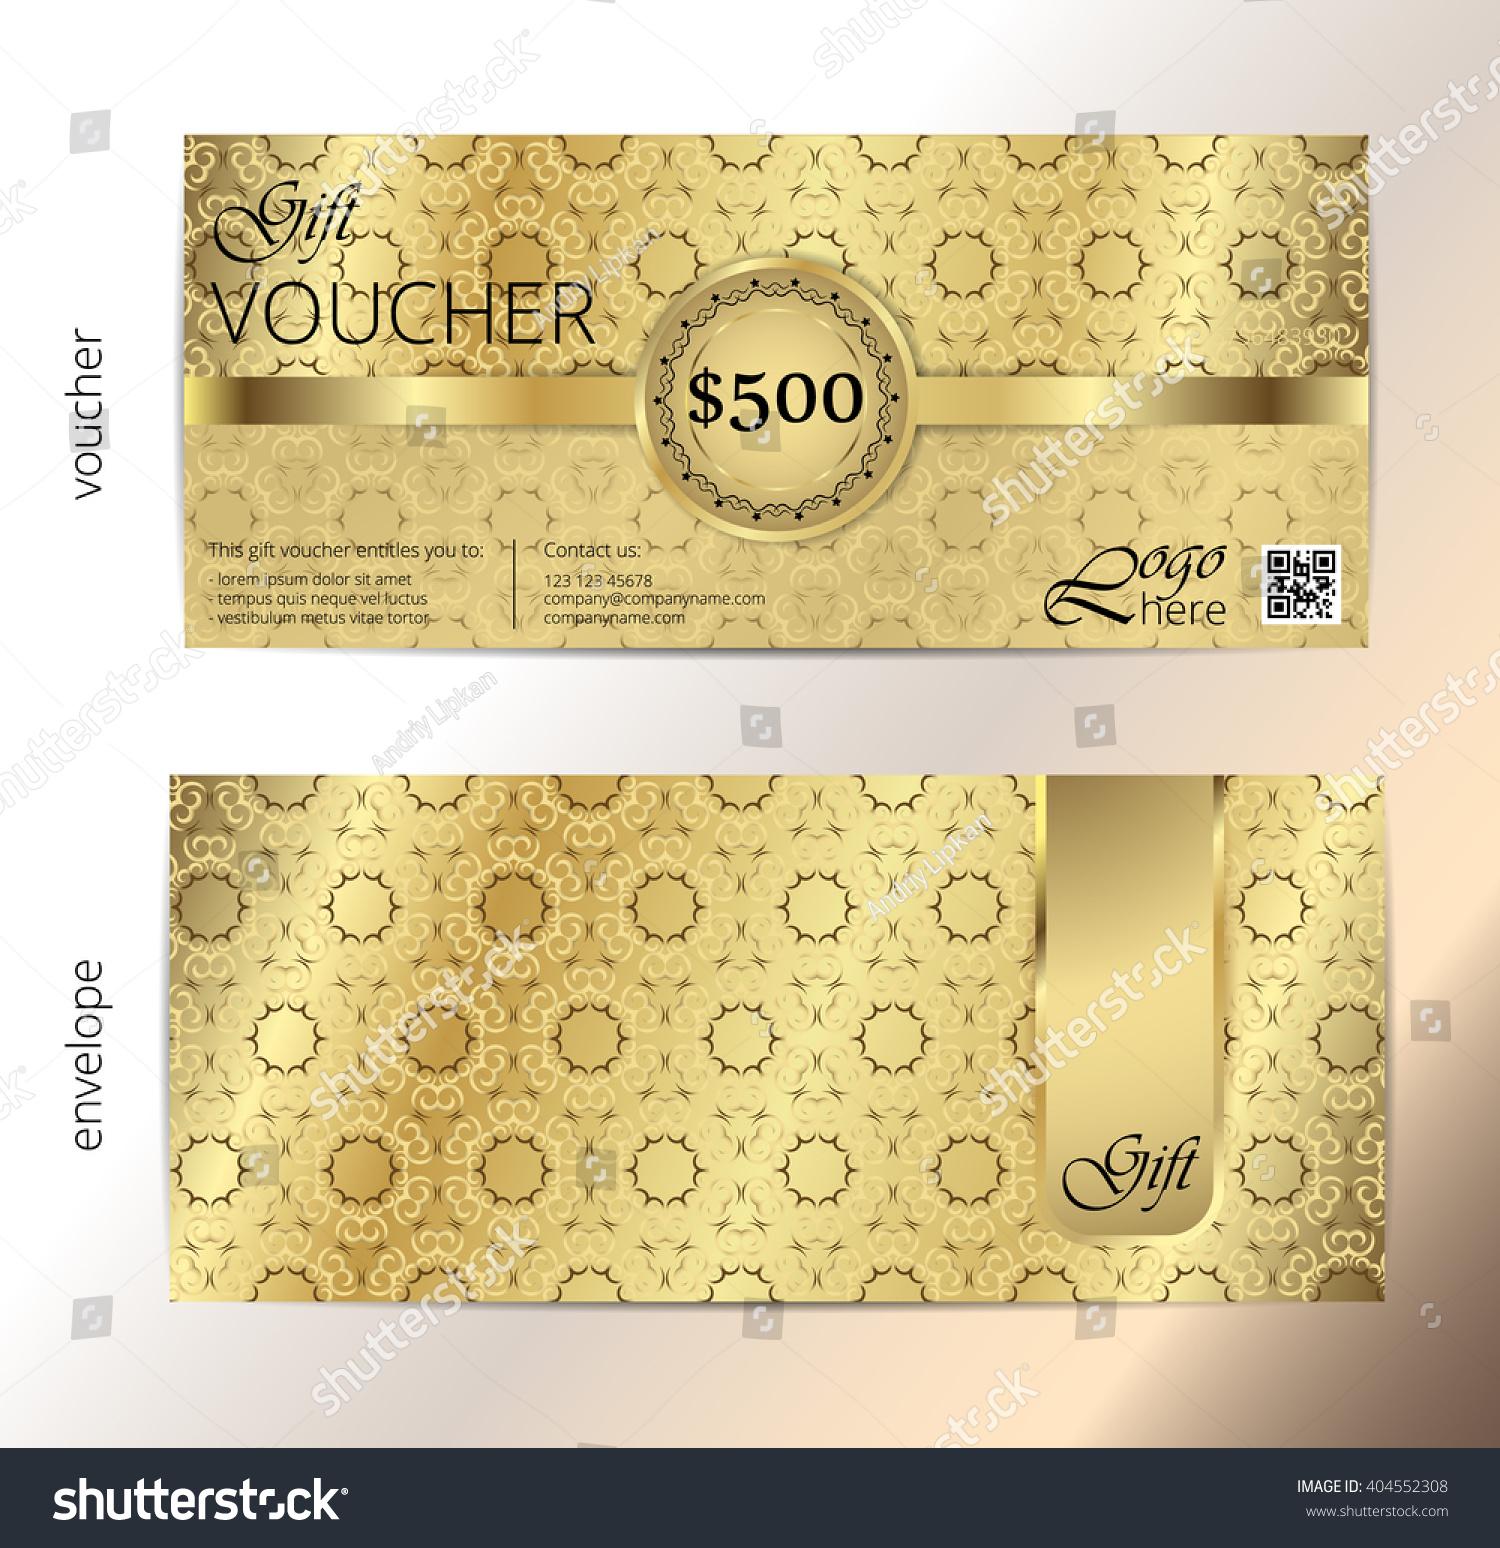 Voucher Voucher Gold Gift Luxury Certificate Vector – Money Coupon Template